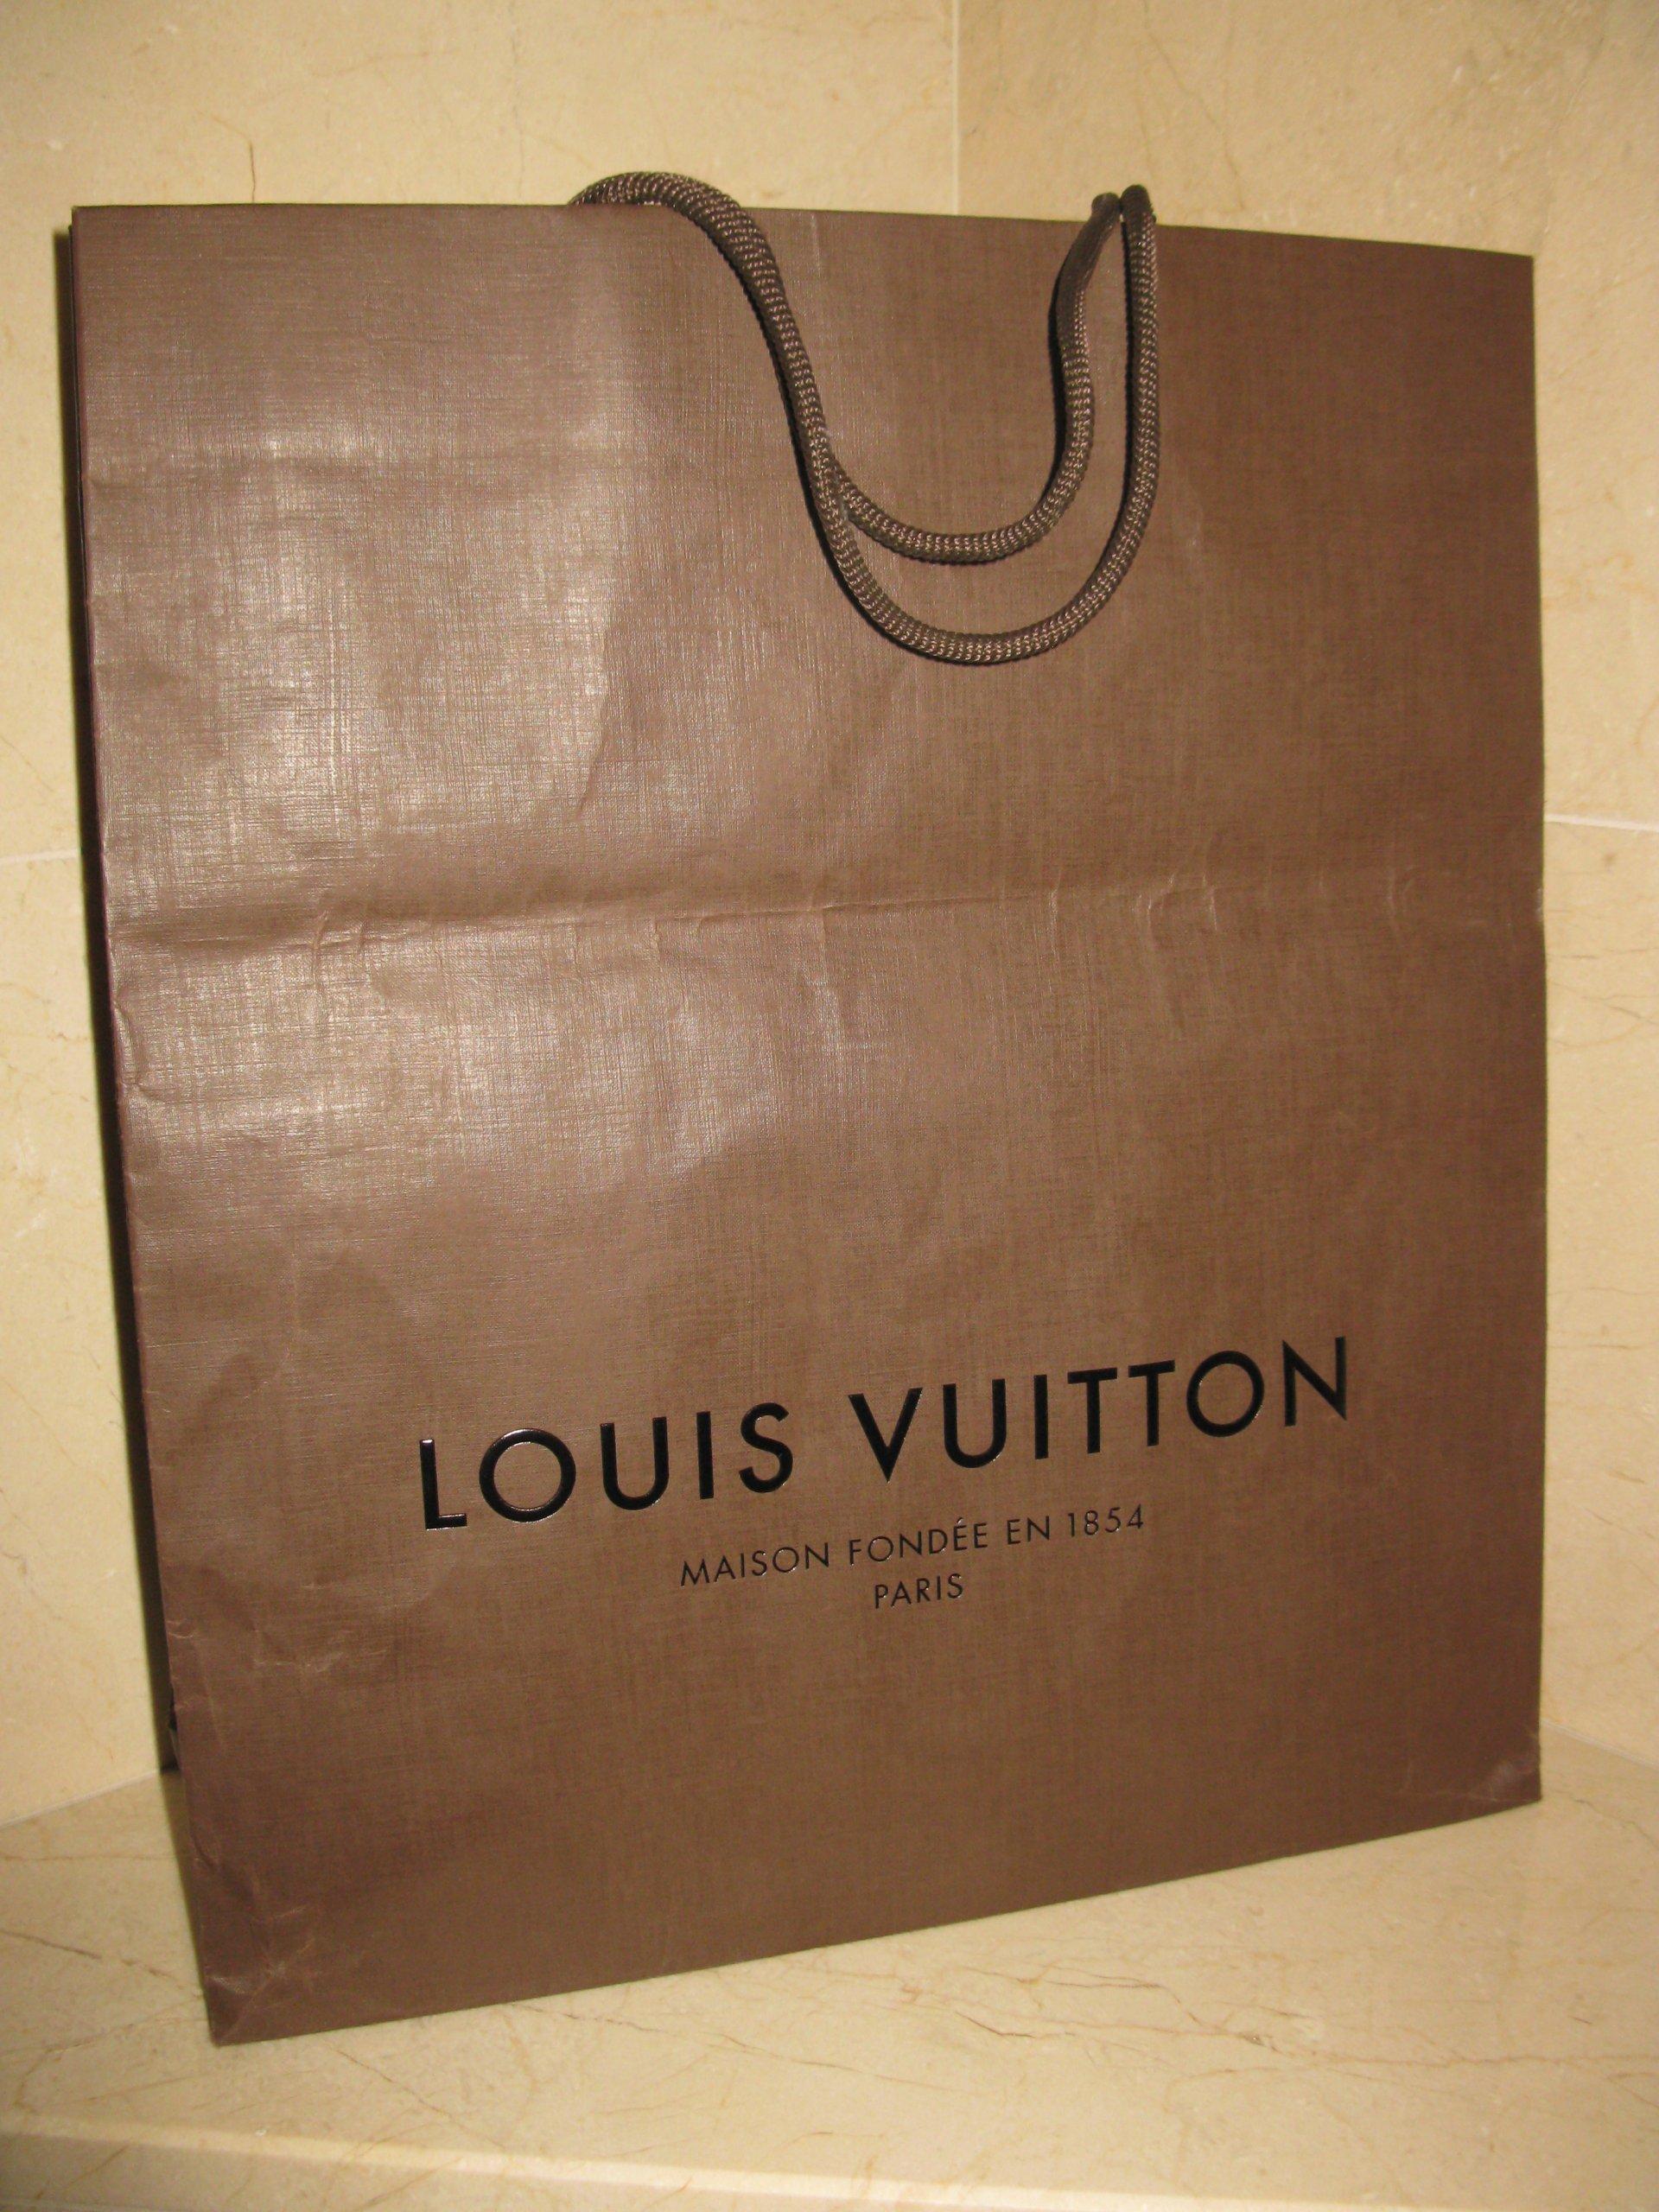 e6b6970d99e09 LOUIS VUITTON torba papierowa L NOWA - 7291529873 - oficjalne ...